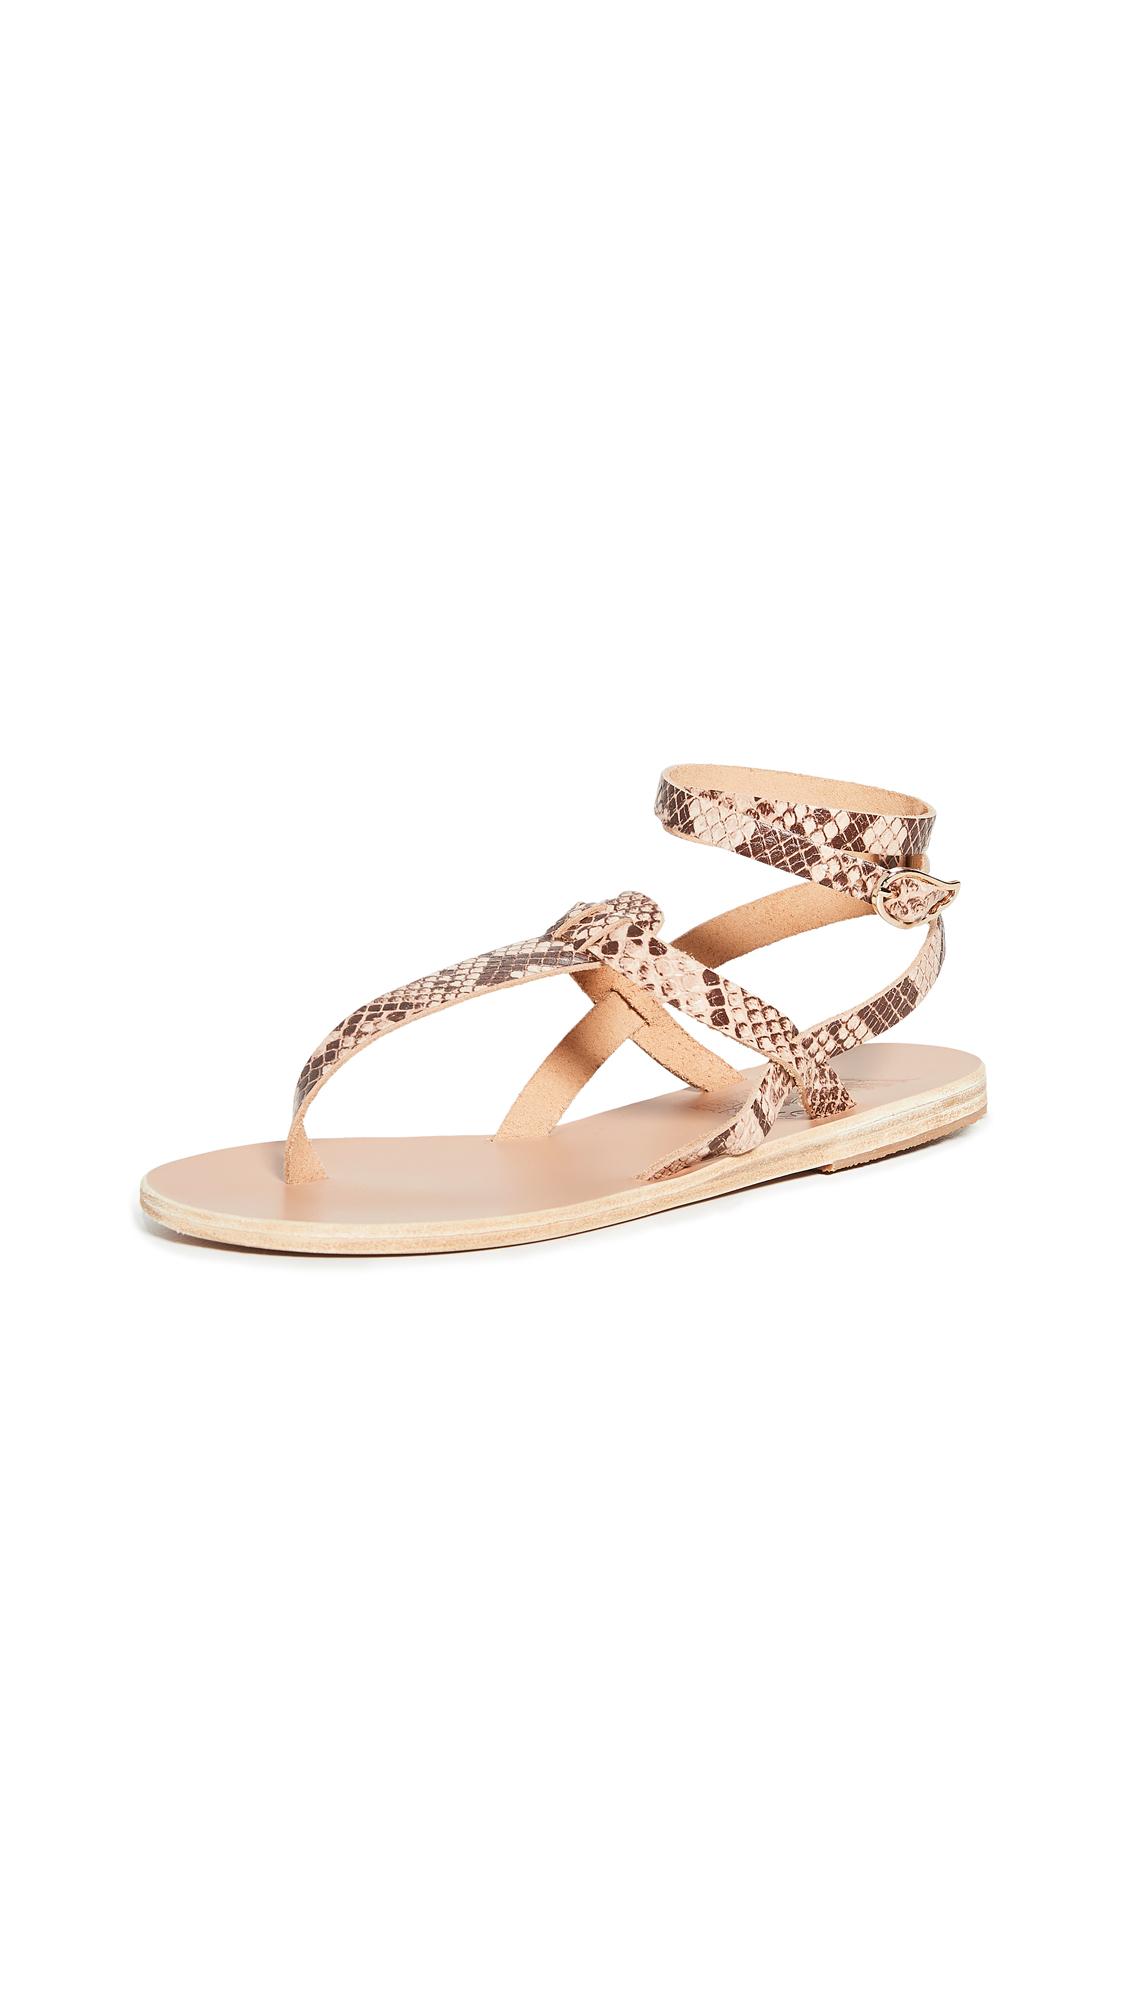 Buy Ancient Greek Sandals Estia Sandals online, shop Ancient Greek Sandals